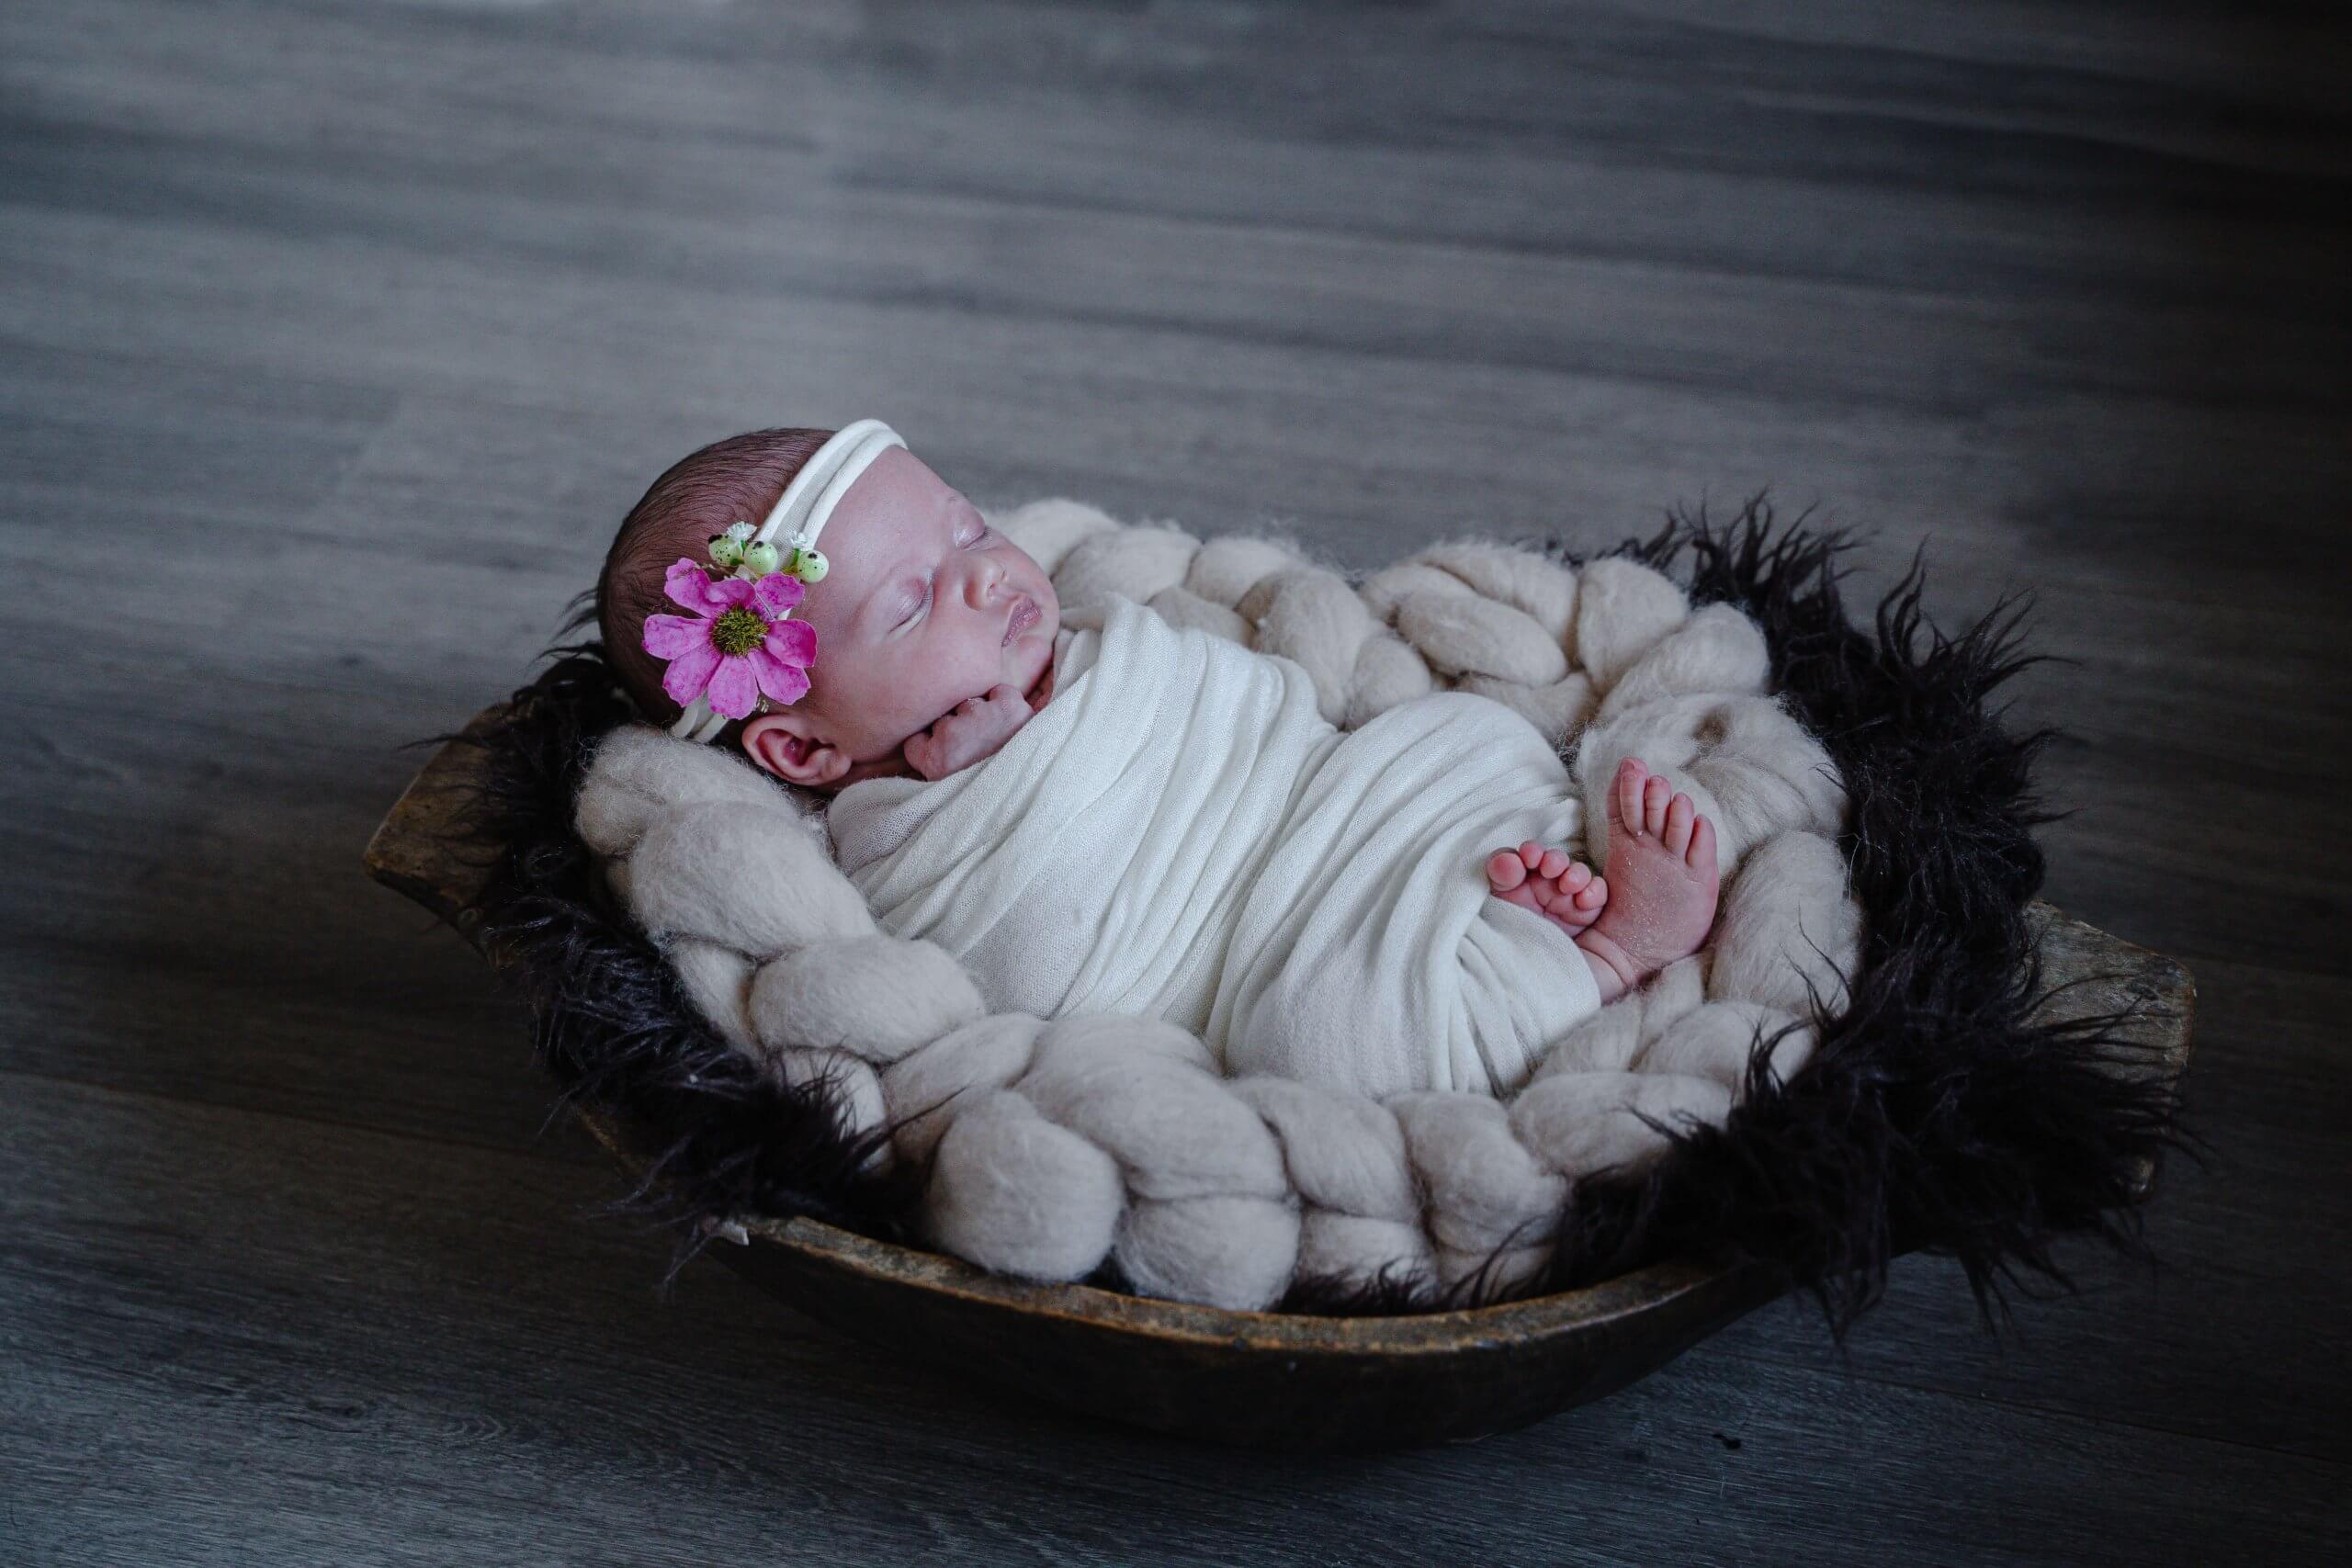 Newborn knuffels lief cute baby newbornbaby fotoshoot bij je thuis at home